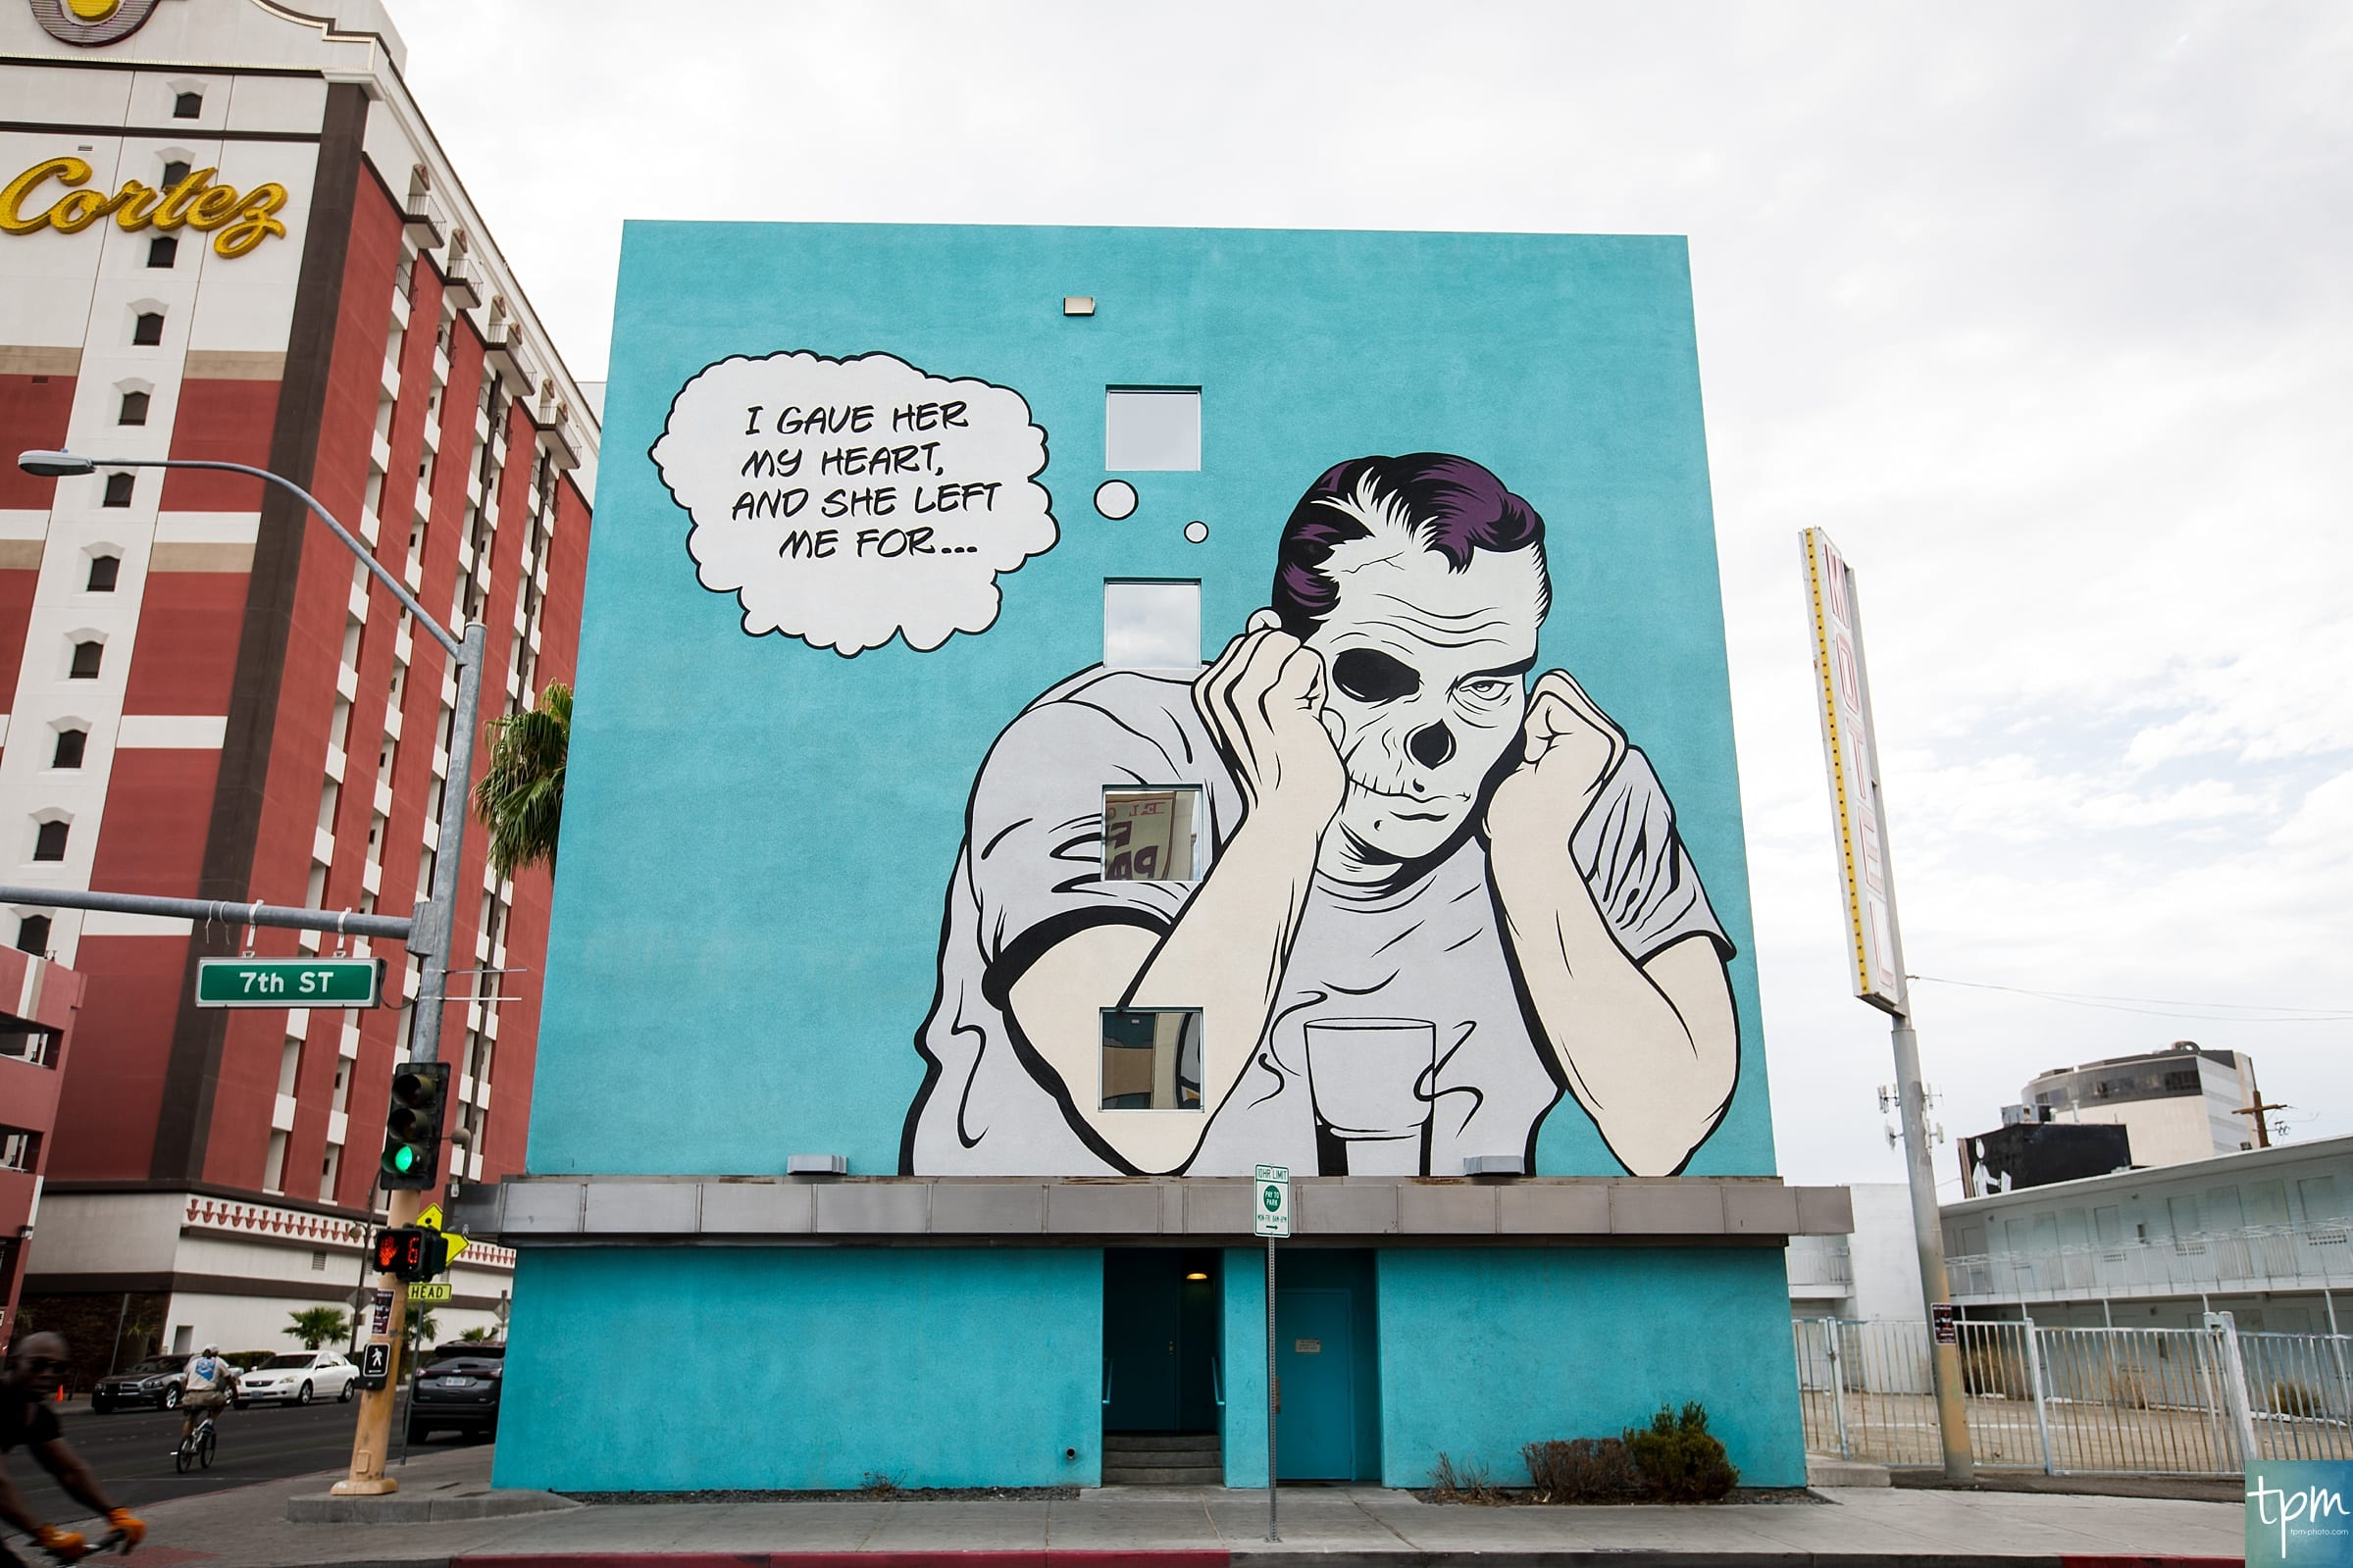 D*Face, 7th Street, Taylored Photo Memories, Las Vegas Murals